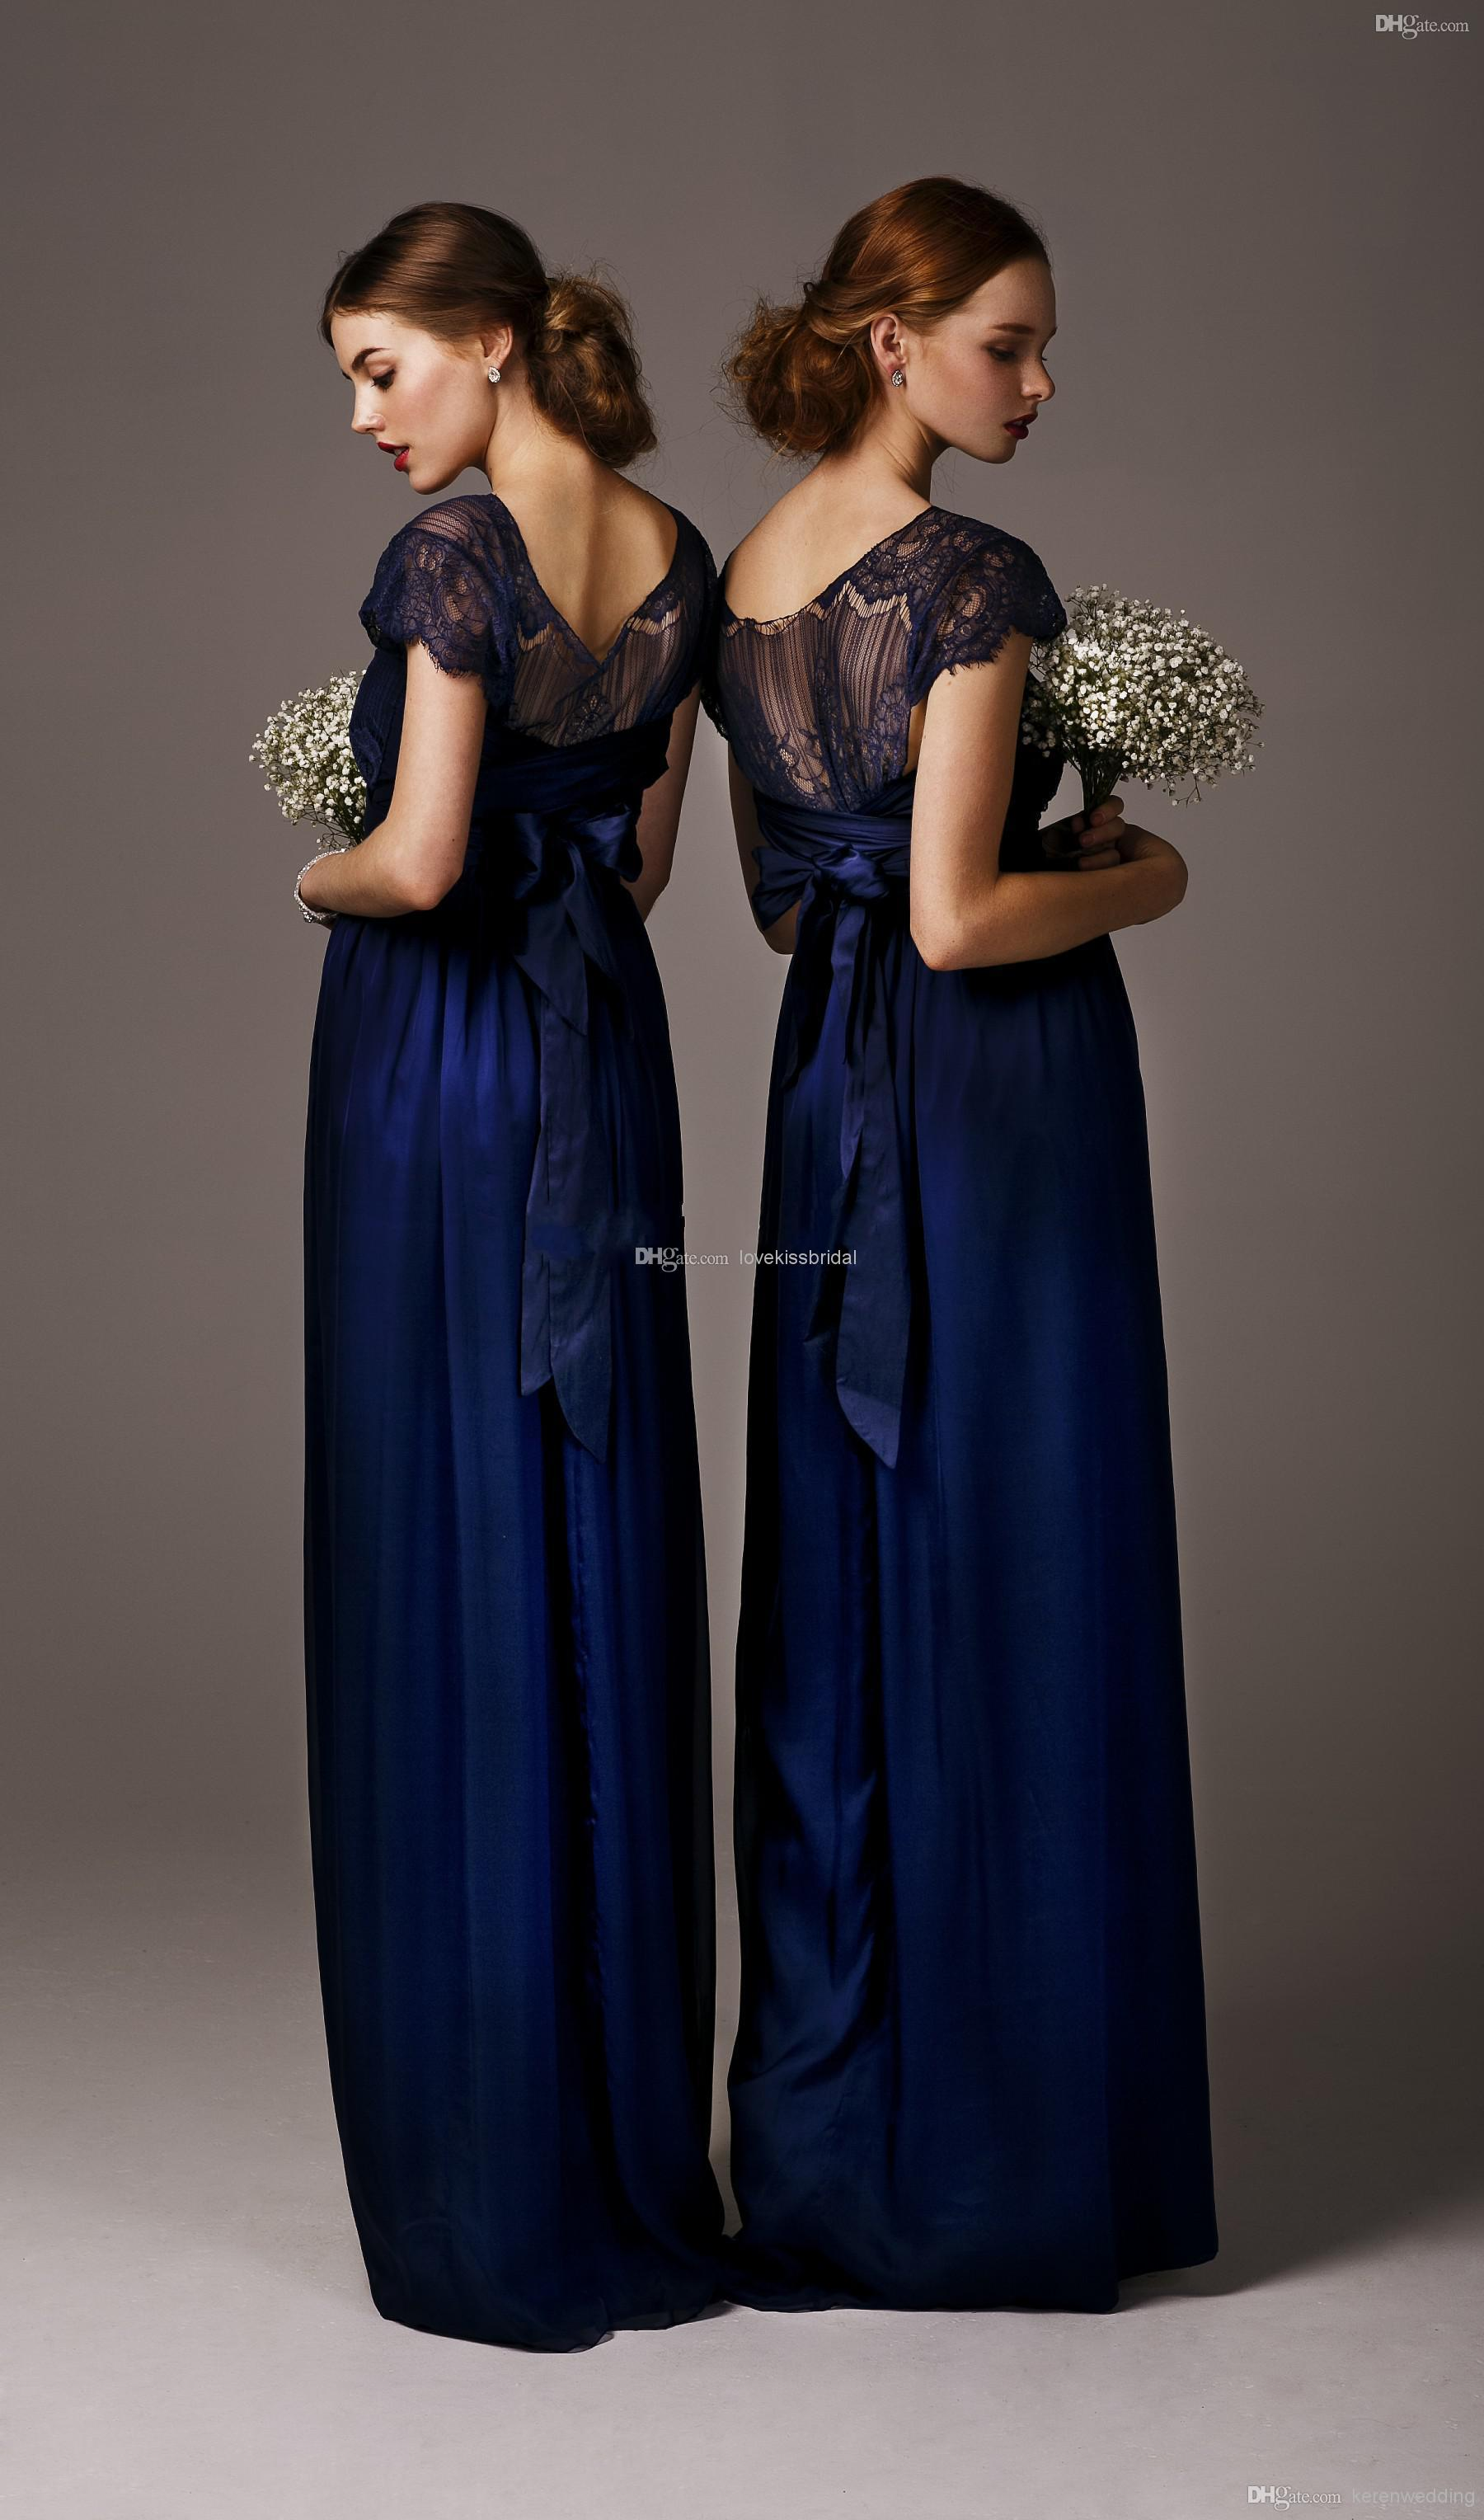 Wholesale Cheap Bridesmaid Dress - Buy 2014 Cheap Elegant Blue Long Junior Bridesmaid Dresses Ribbon Sash Sheer Lace Neck Evening Bridesmaids Party Gowns Wedding Custom Made, $69.11 | DHgate